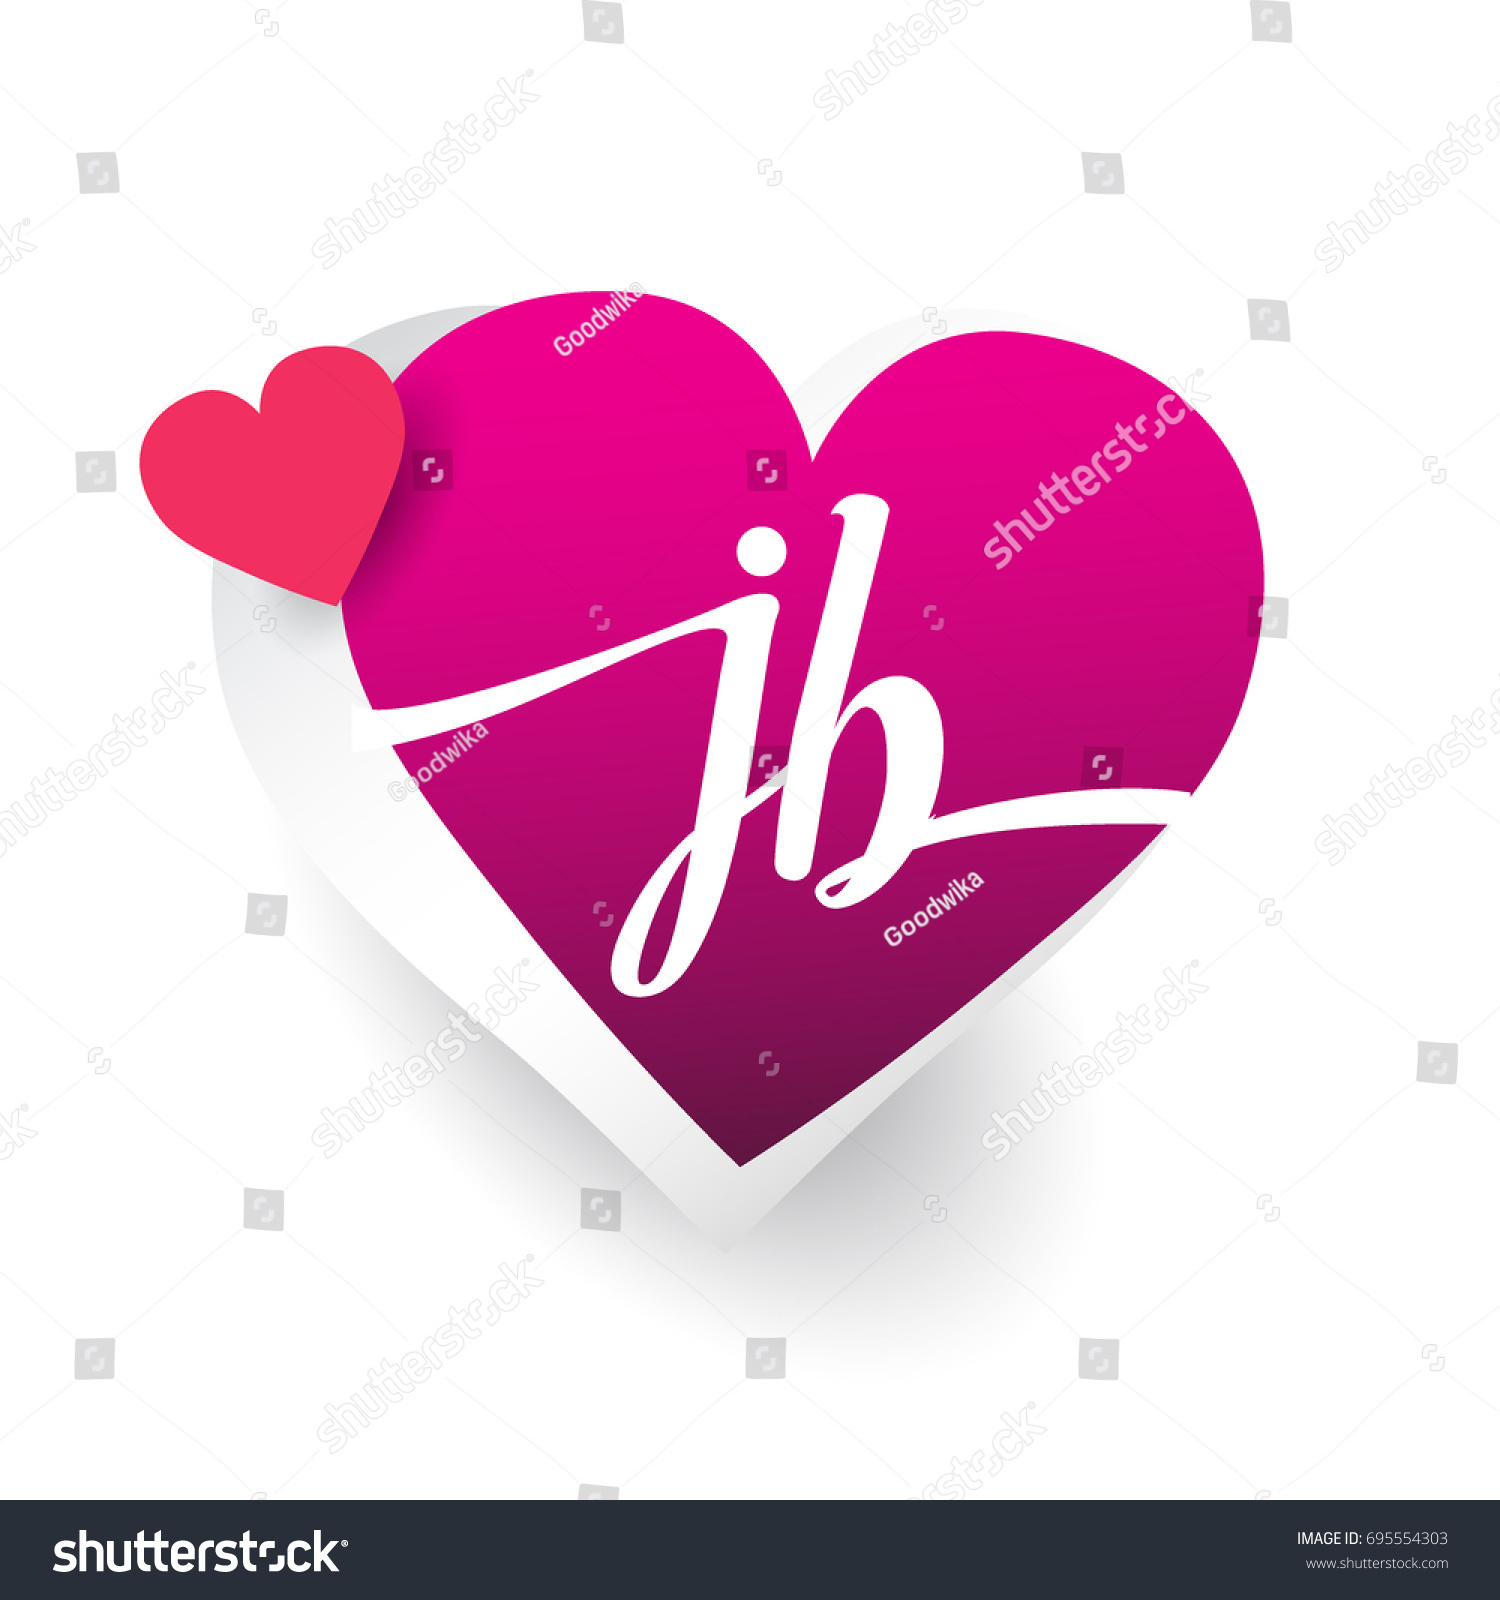 Initial logo letter jb heart shape stock vector royalty free initial logo letter jb with heart shape red colored logo design for wedding invitation stopboris Choice Image